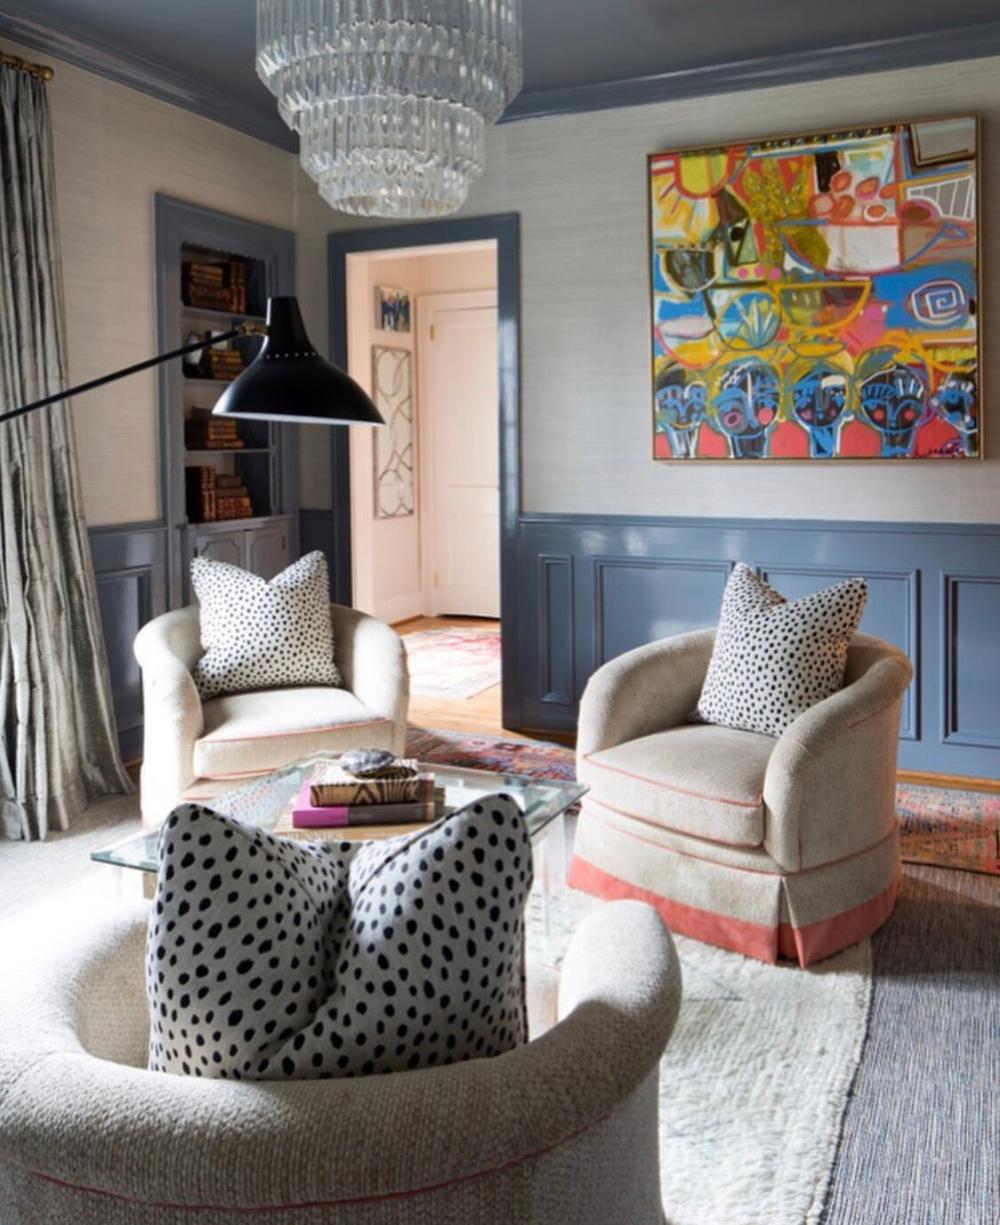 Sally King Benedict Whitney Durham Interiors Julie Wynne Jones Art Design Consulting In 2020 Interior Living Room Inspiration Interior Art